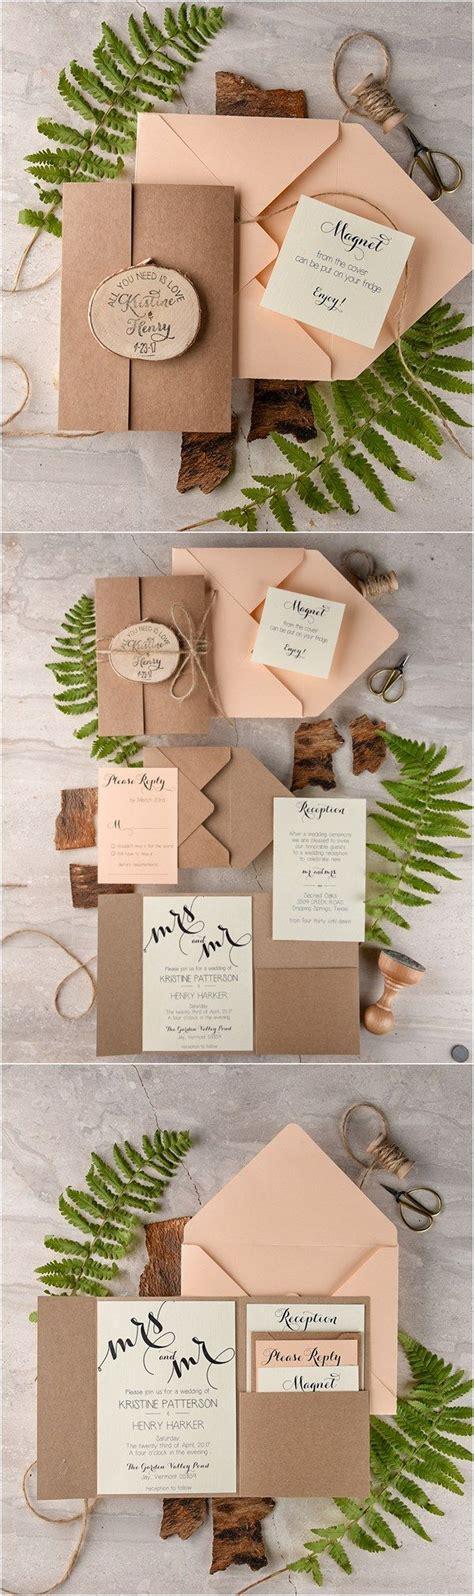 handmade wedding invitations sheffield 25 best ideas about wedding dresses on